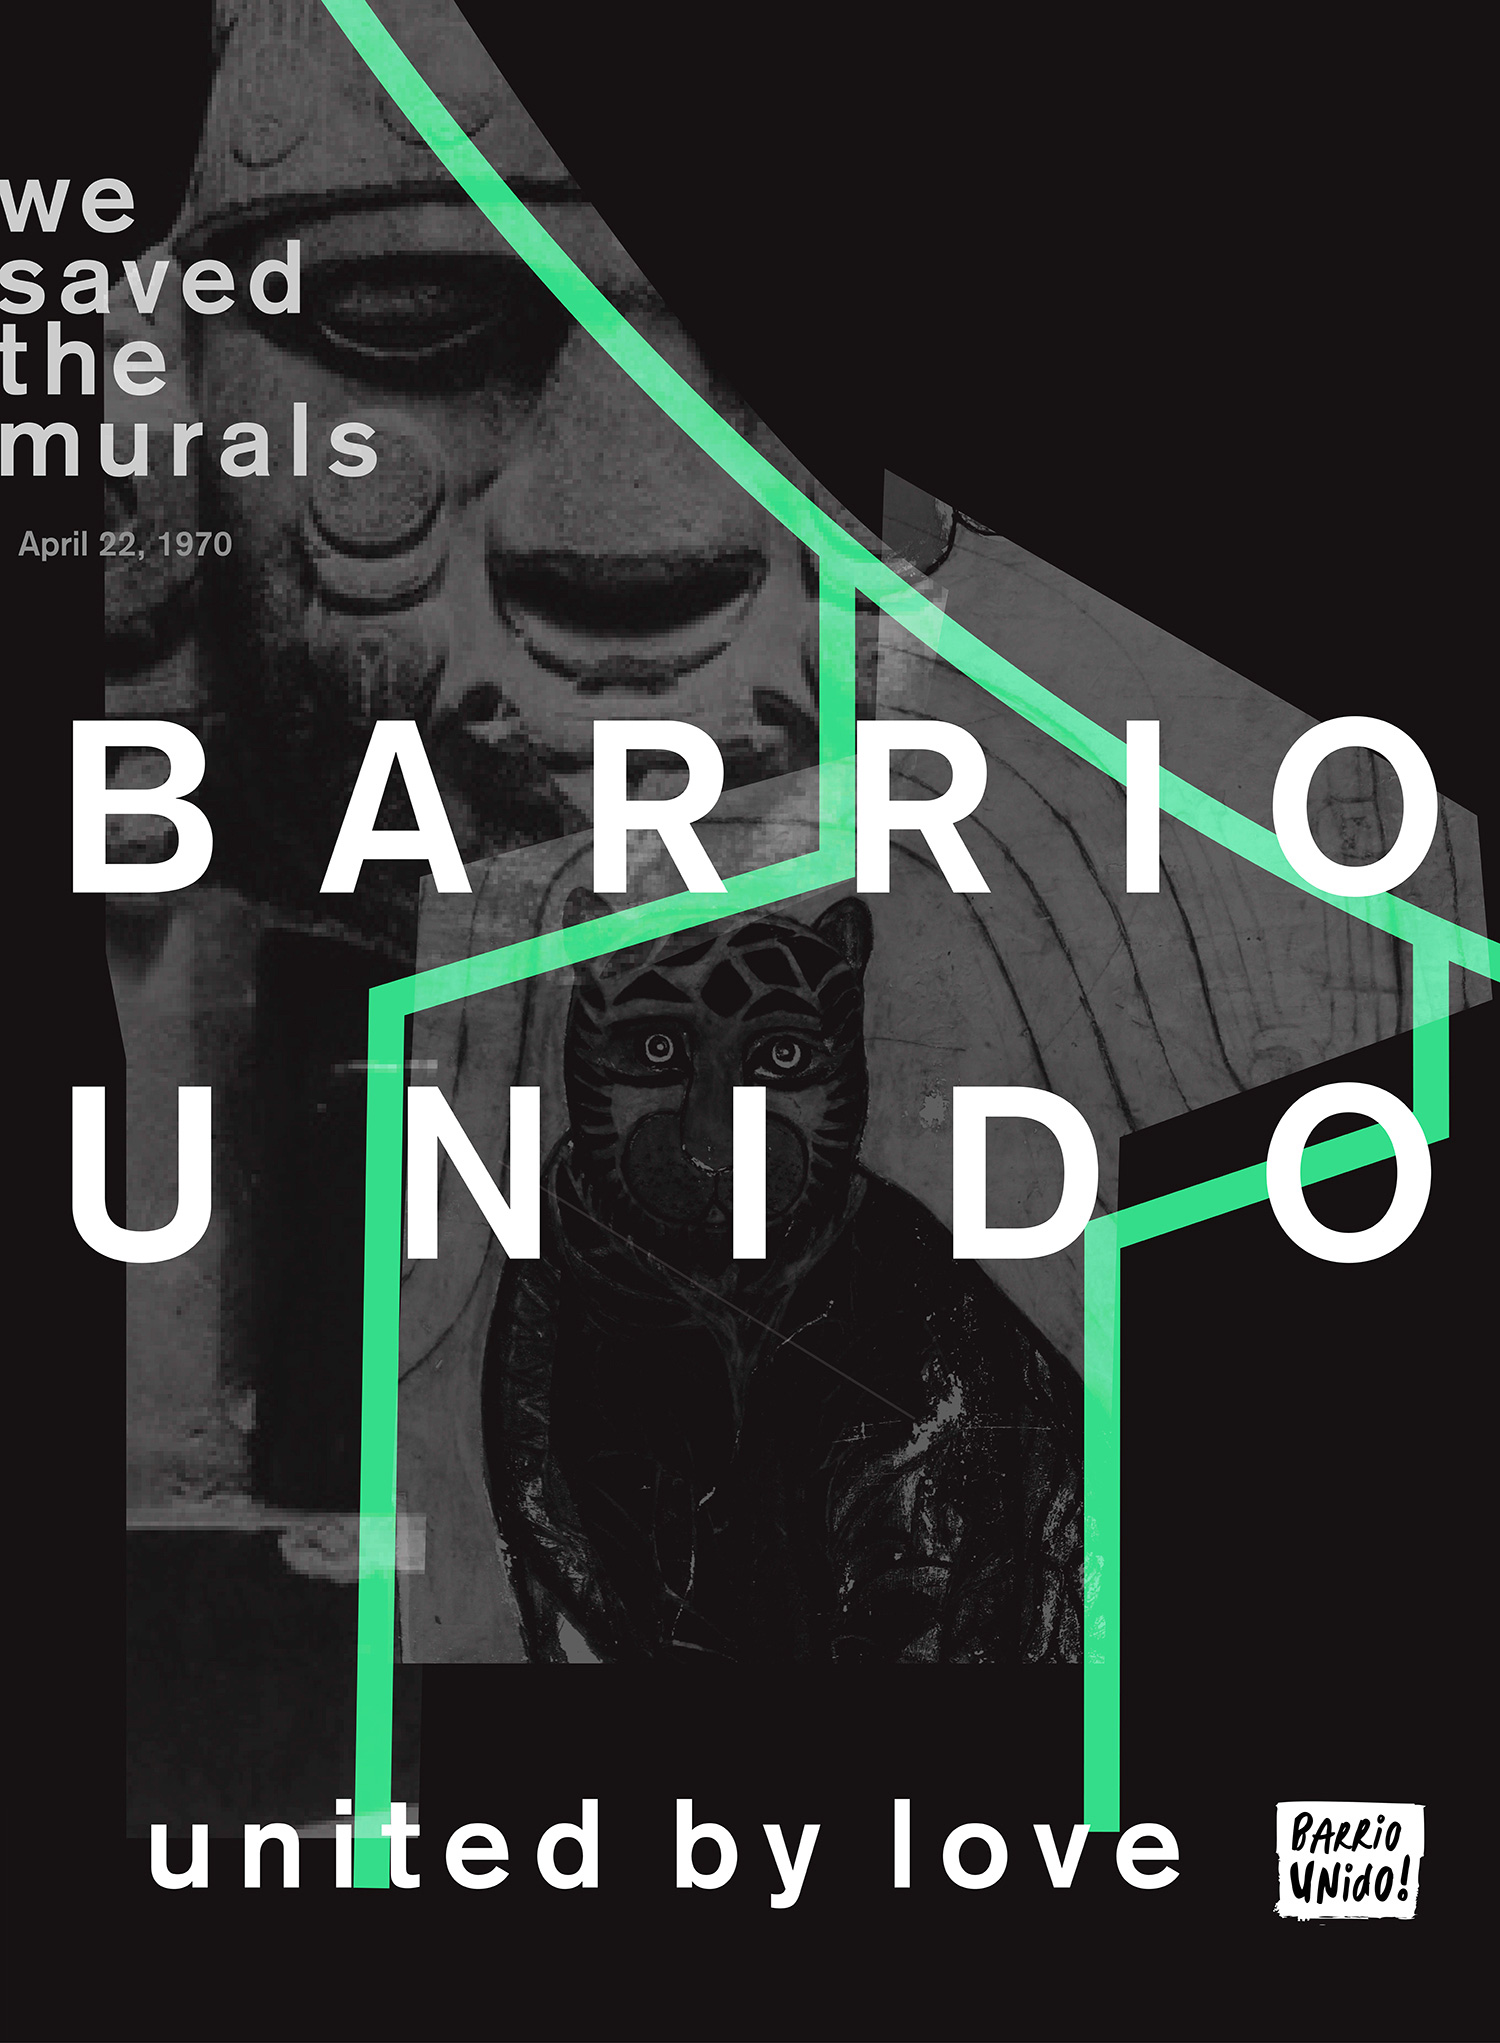 ron-miriello-grafico-barrio-logan-posters-san-diego-community-design-Miriello-branding-officina-06.jpg